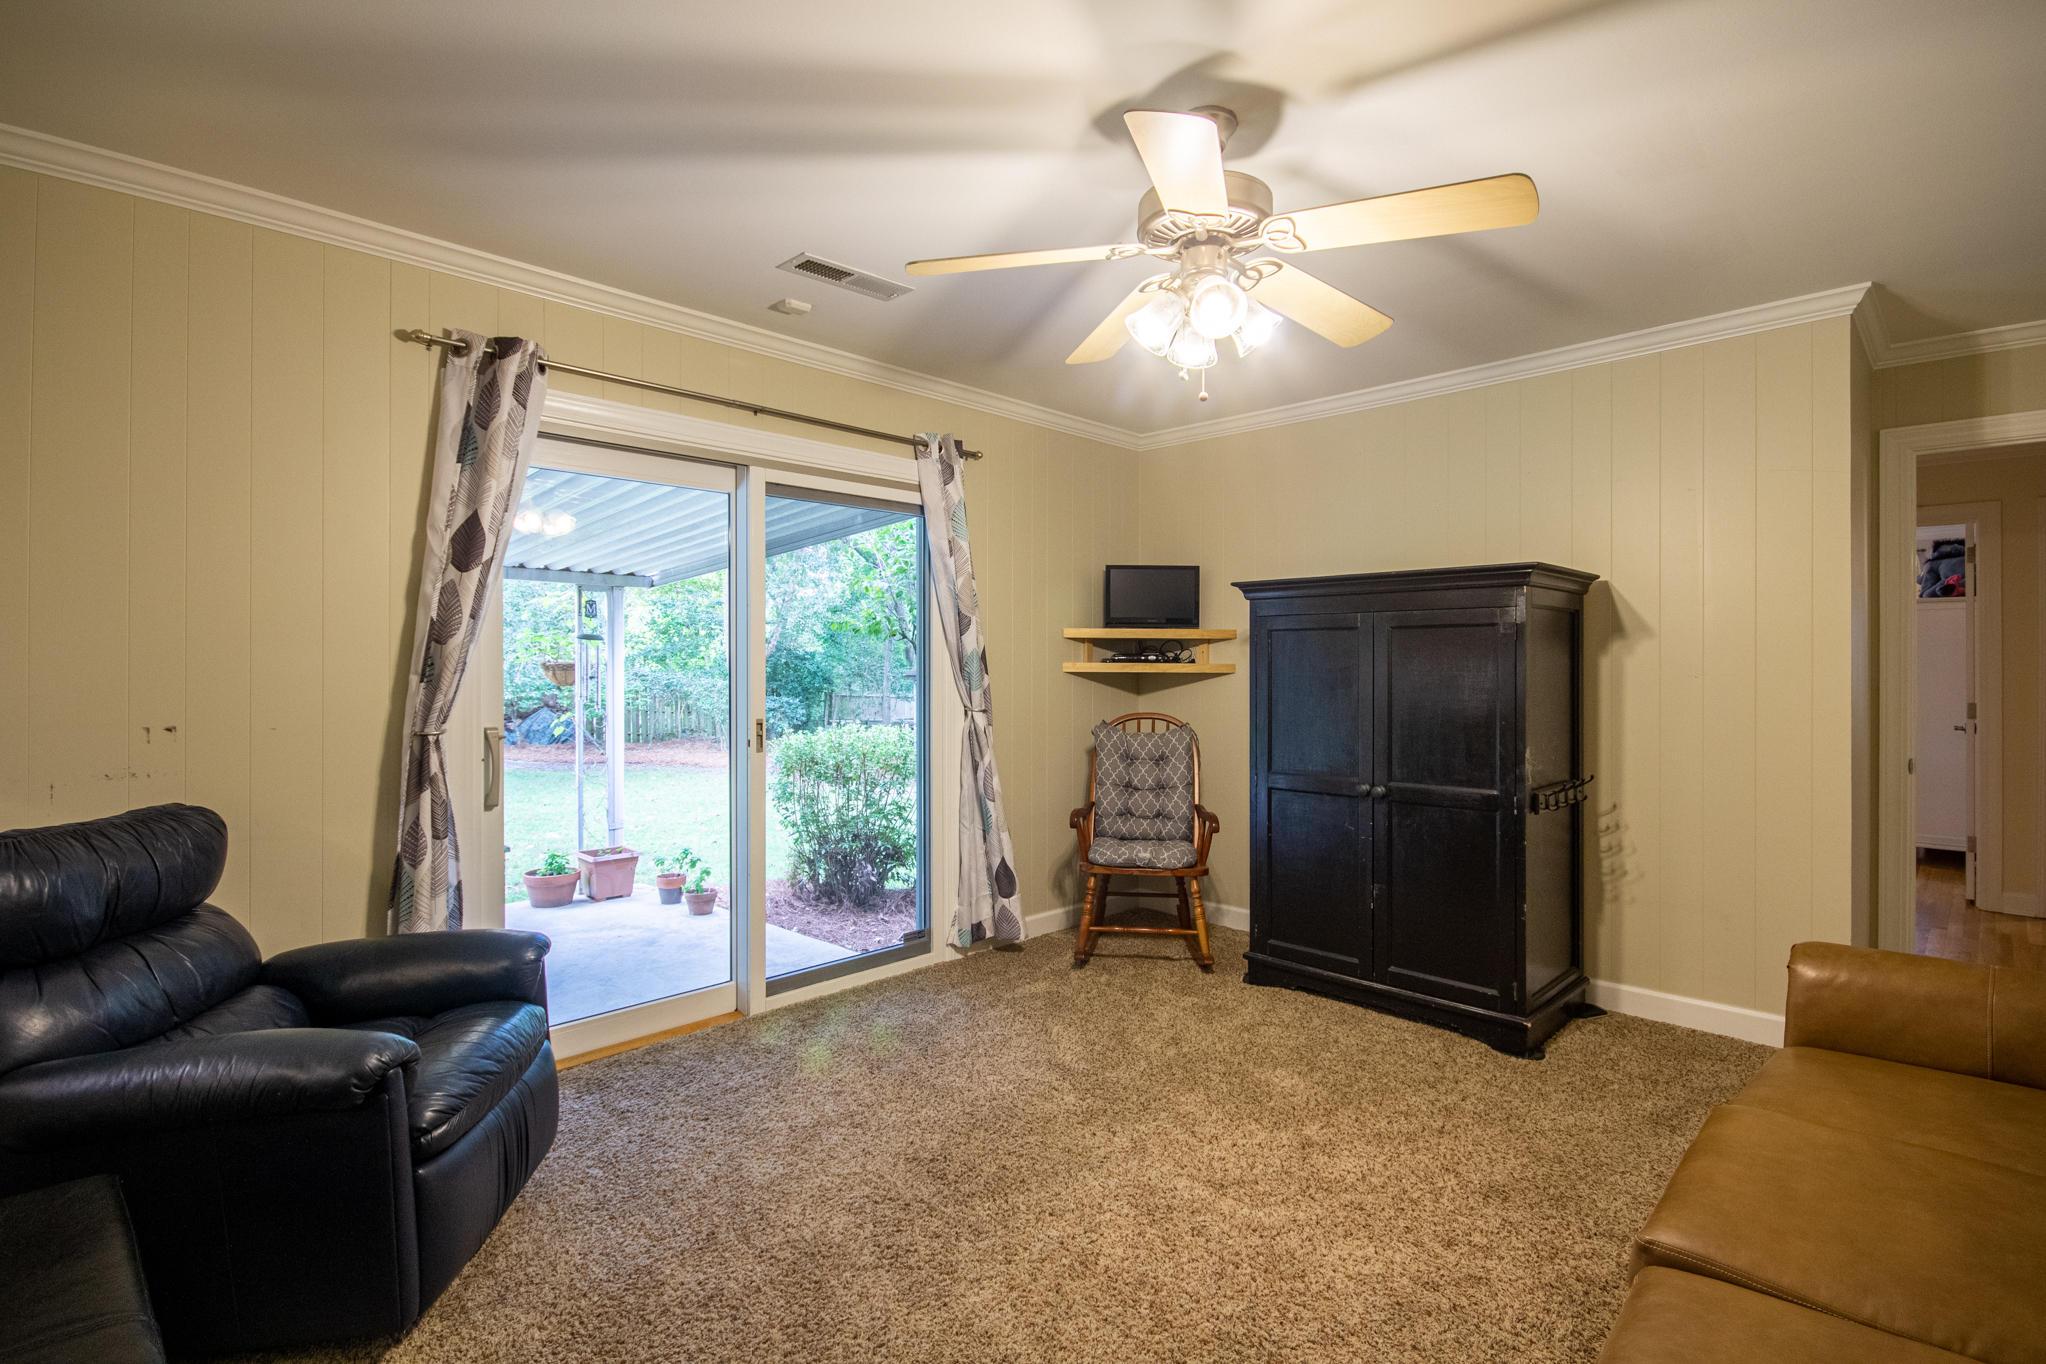 Belvedere Estates Homes For Sale - 6021 Rembert, Hanahan, SC - 20